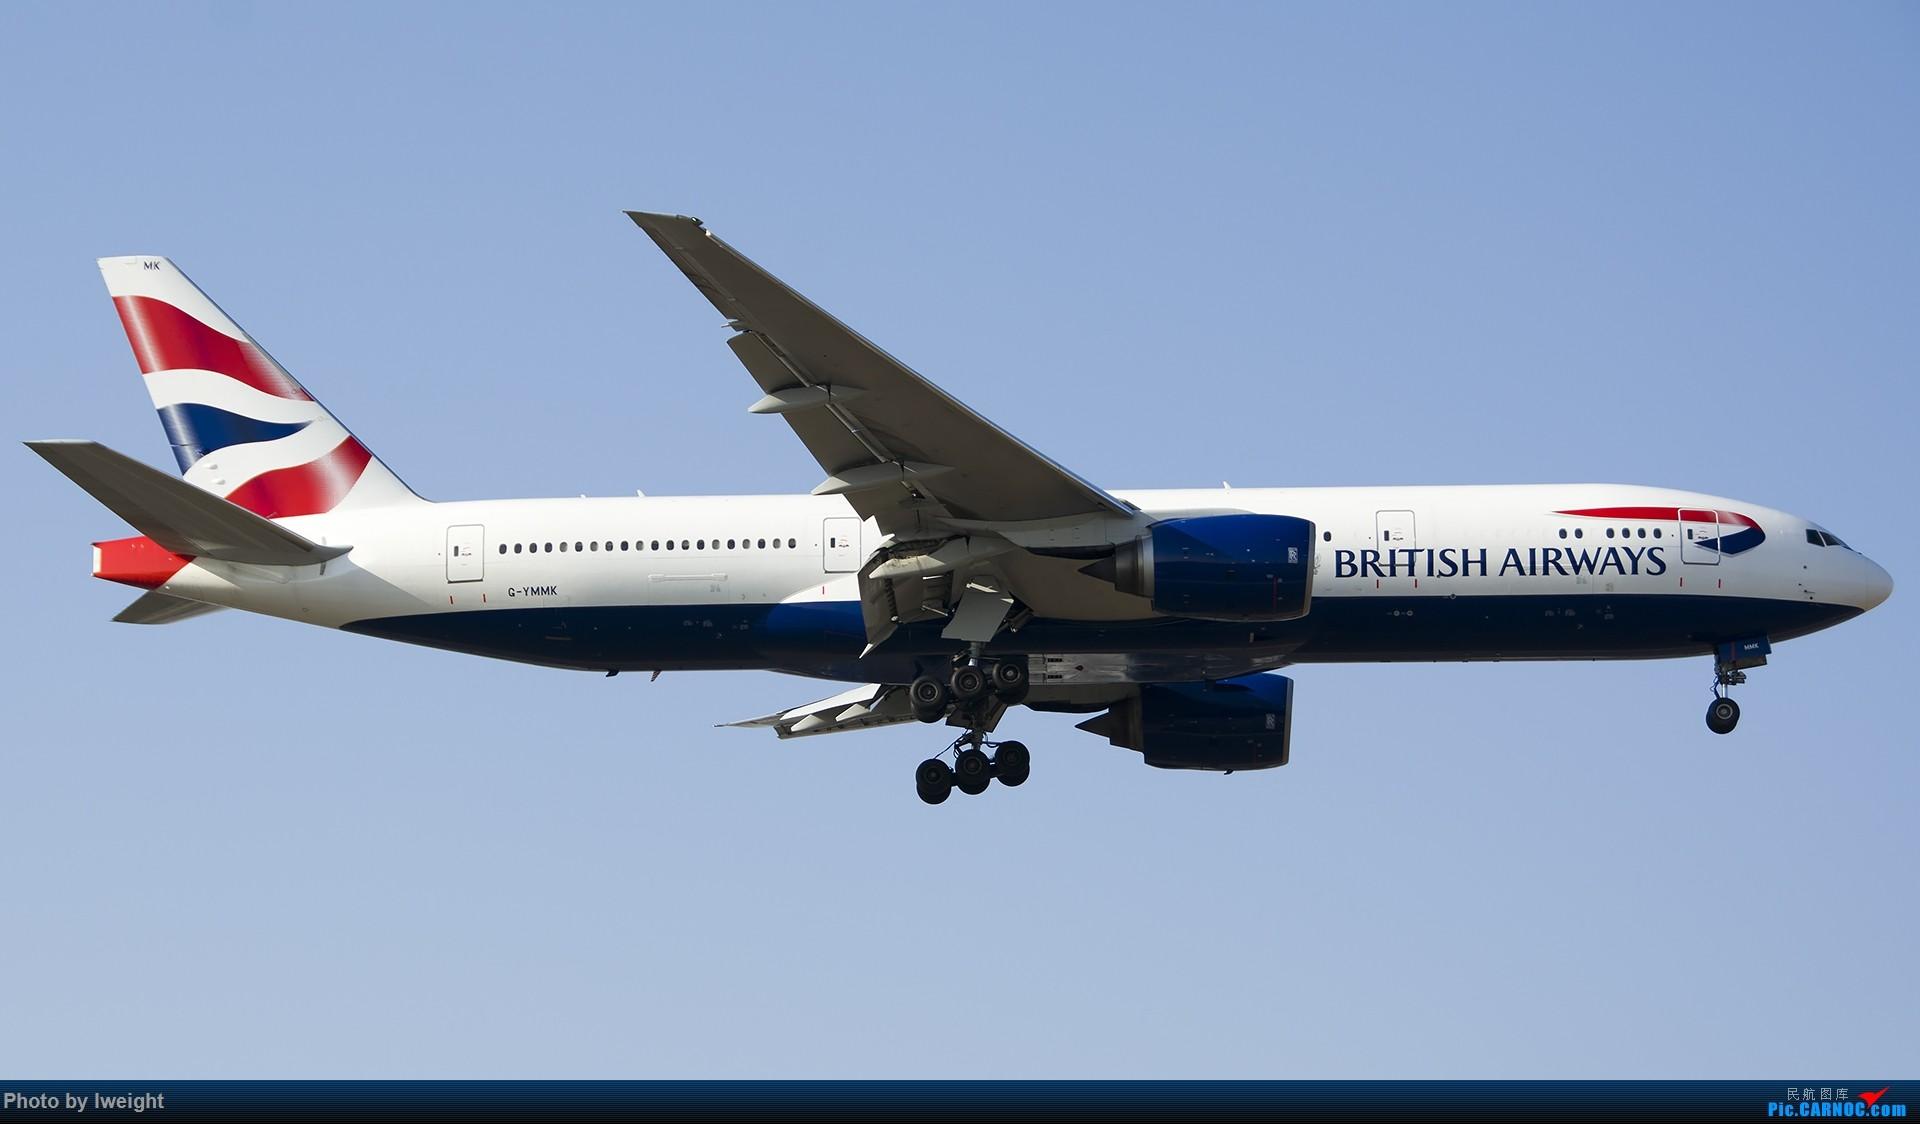 Re:[原创]2014-12-02 ZBAA随拍 BOEING 777-200ER G-YMMK 中国北京首都国际机场